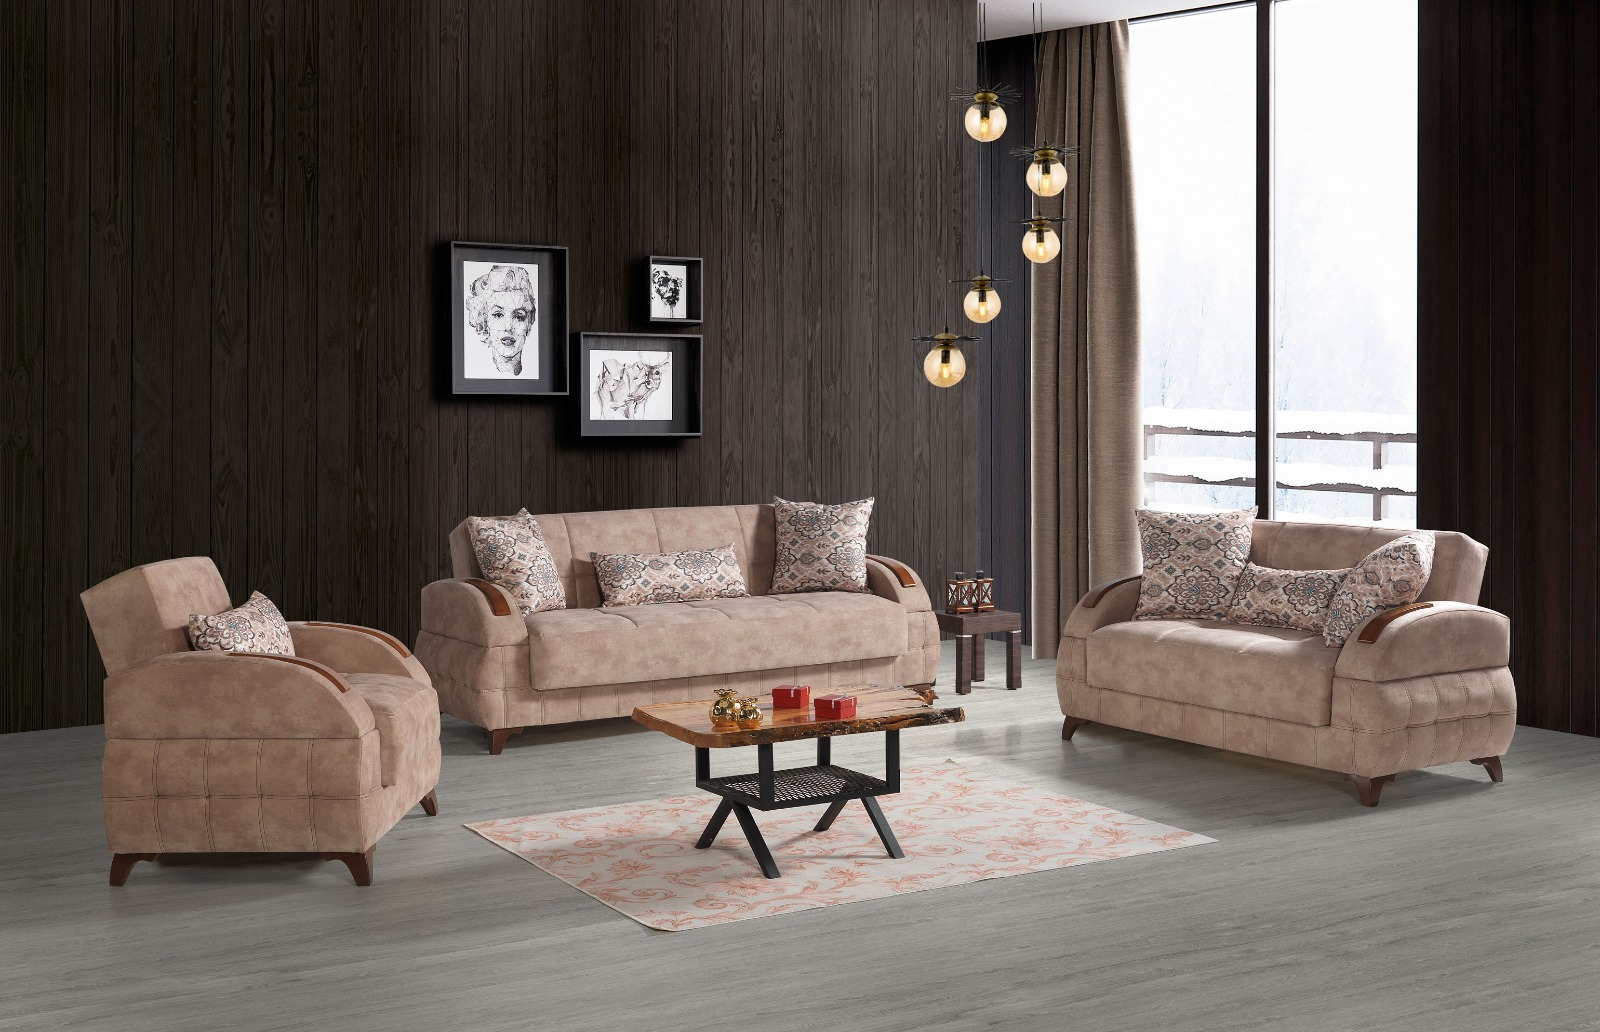 3er 2er 1er Couch Garnitur